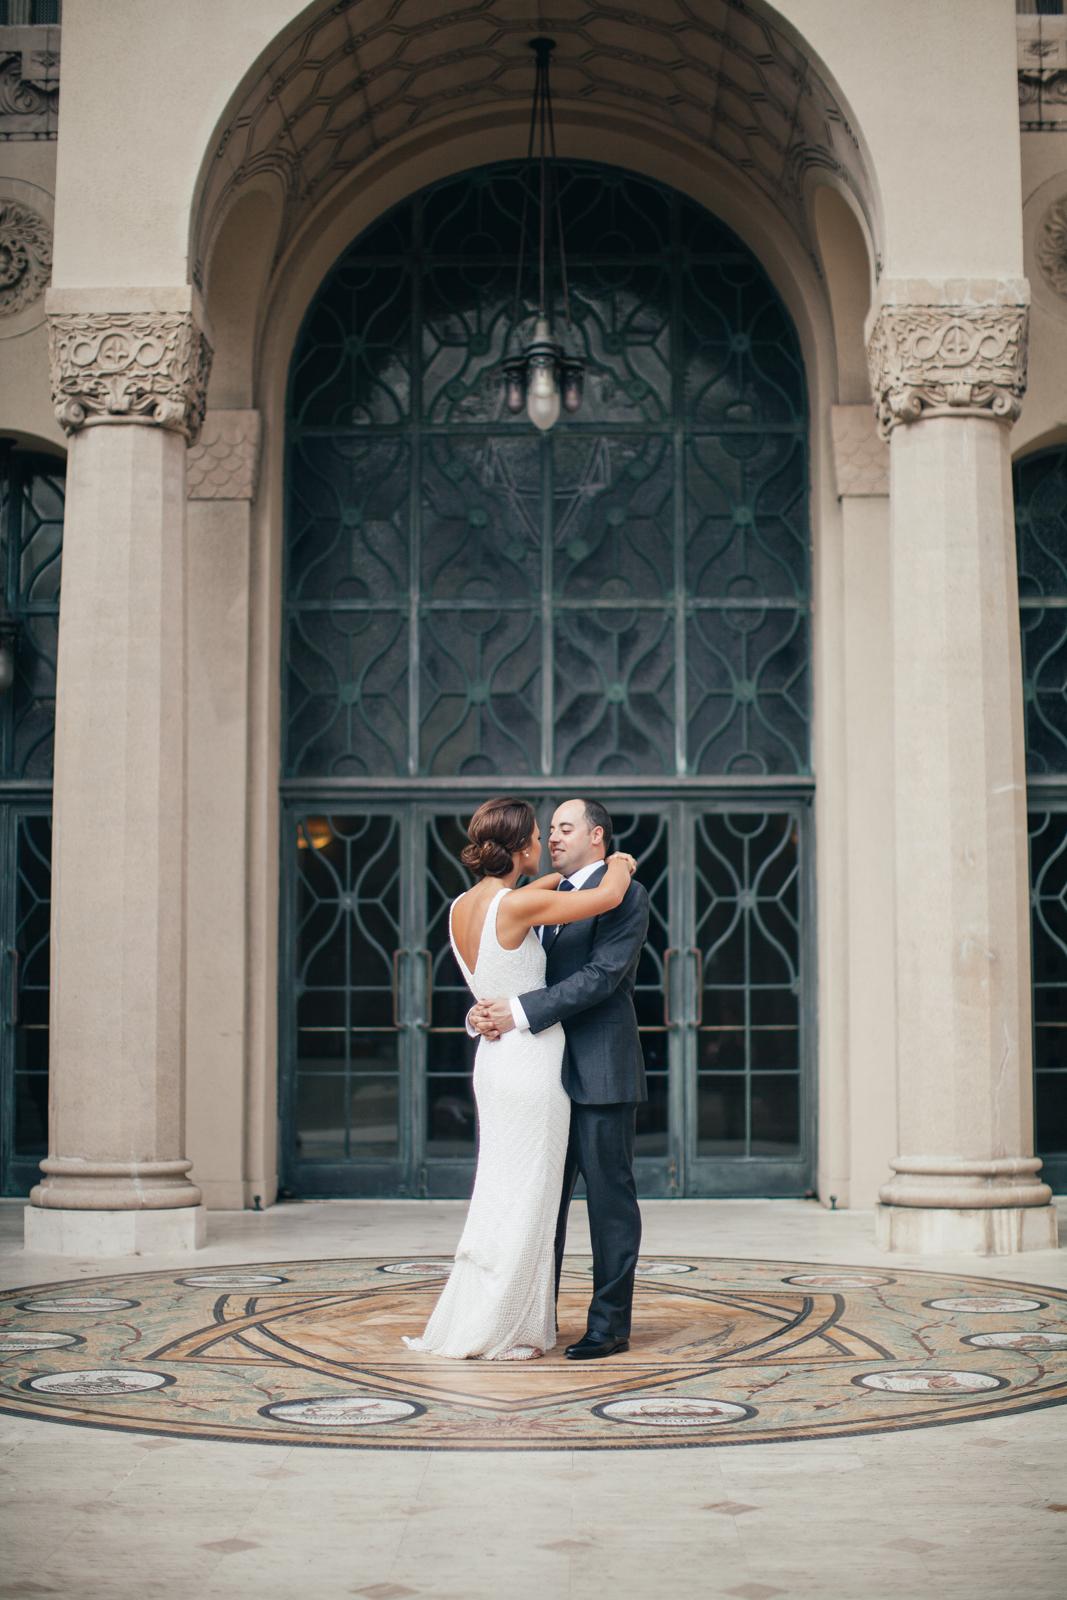 temple_emmanuel_jewish_wedding_san_francisco_ca_sarah_andrew_ebony_siovhan_bokeh_photography_29.jpg